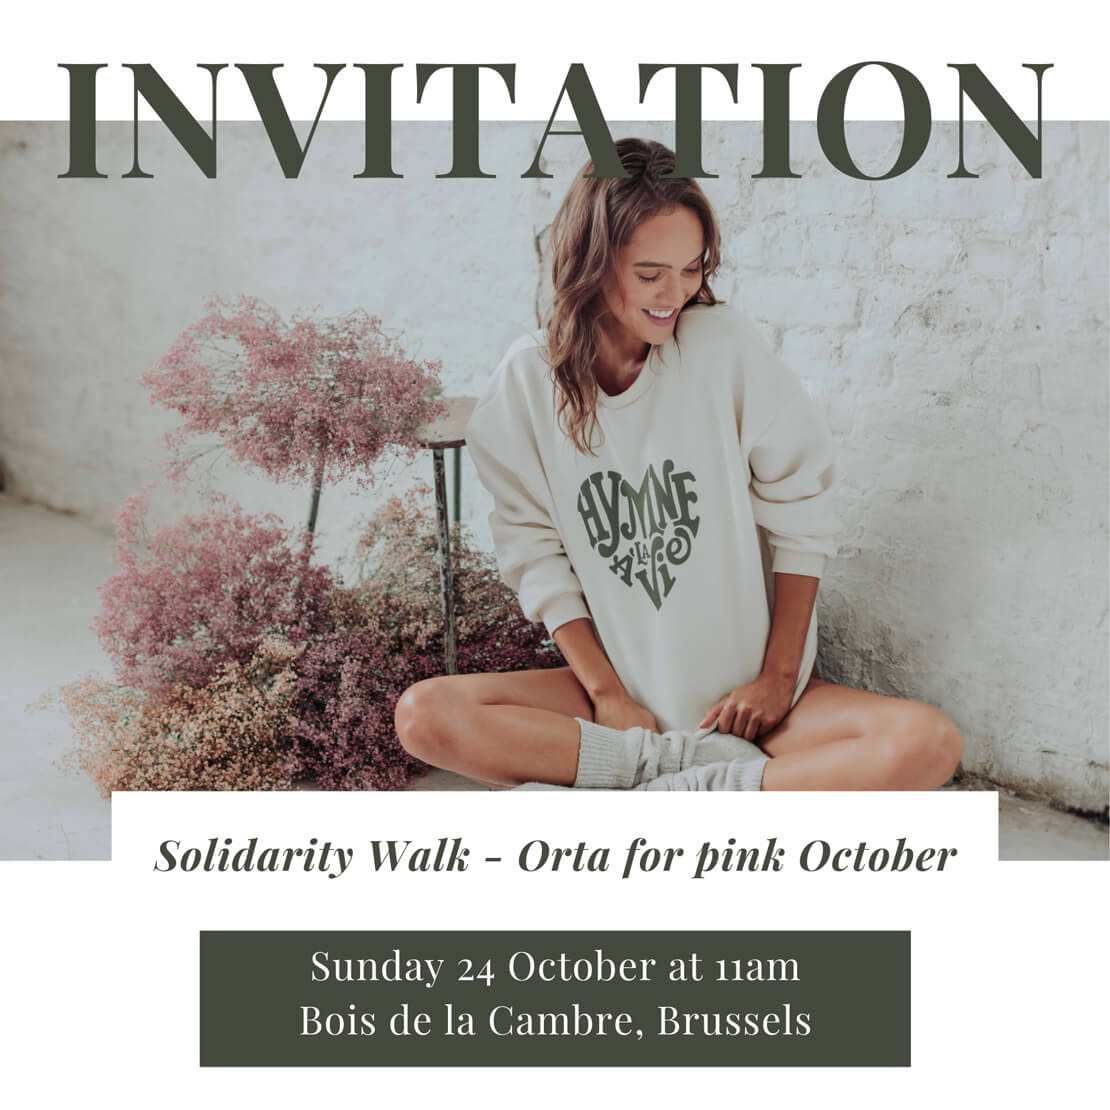 Invitation - Solidarity Walk